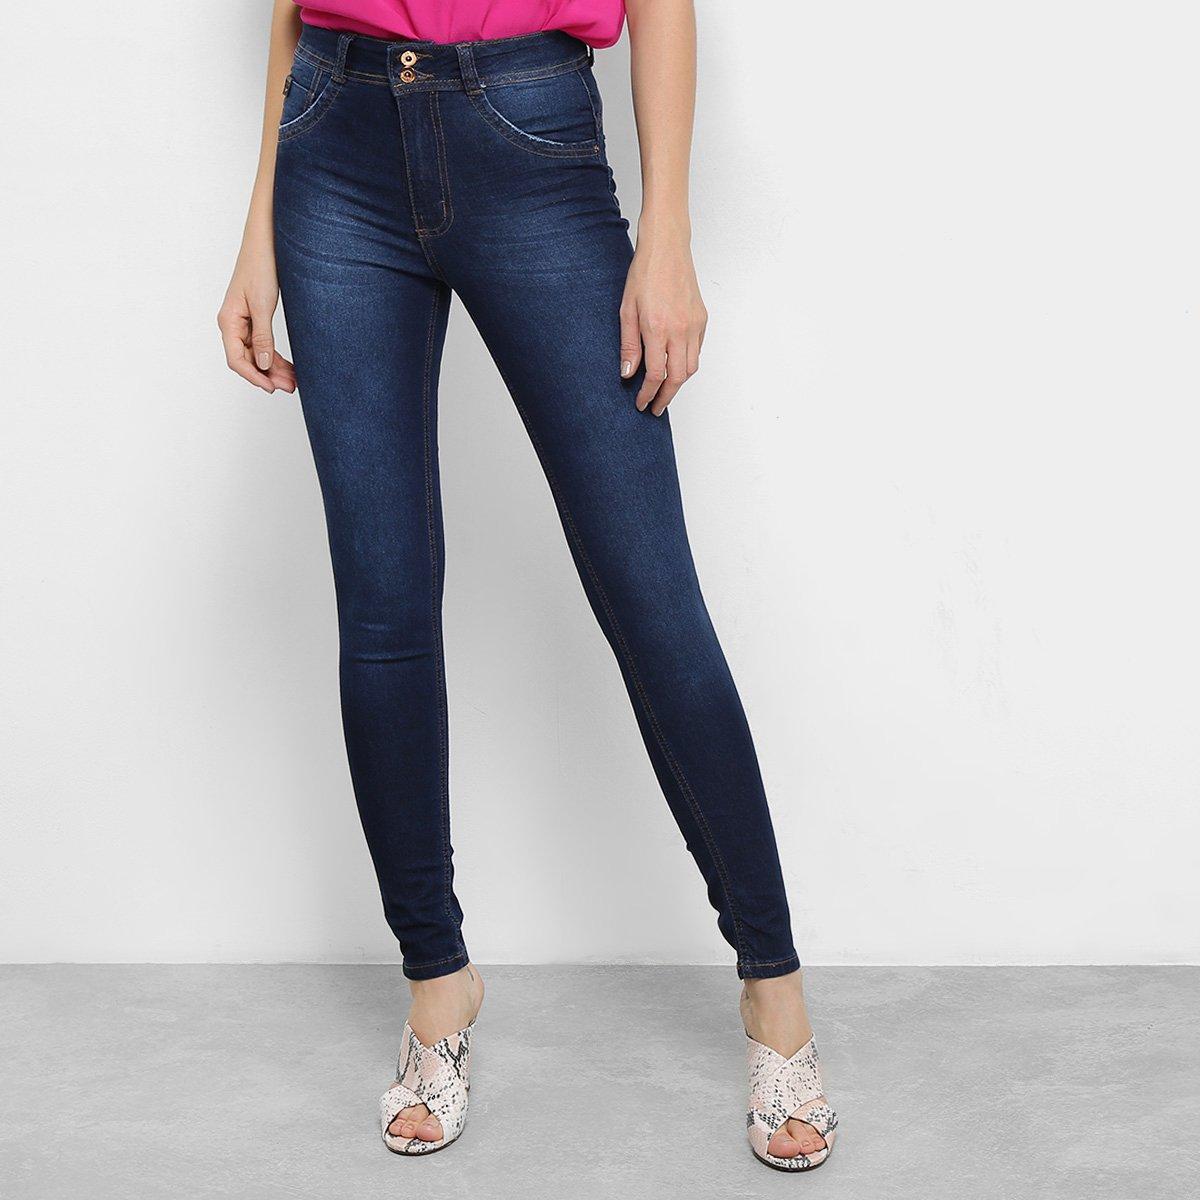 072b7a894 Calça Jeans Skinny Biotipo Estonada Cintura Média Soft Melissa Feminina